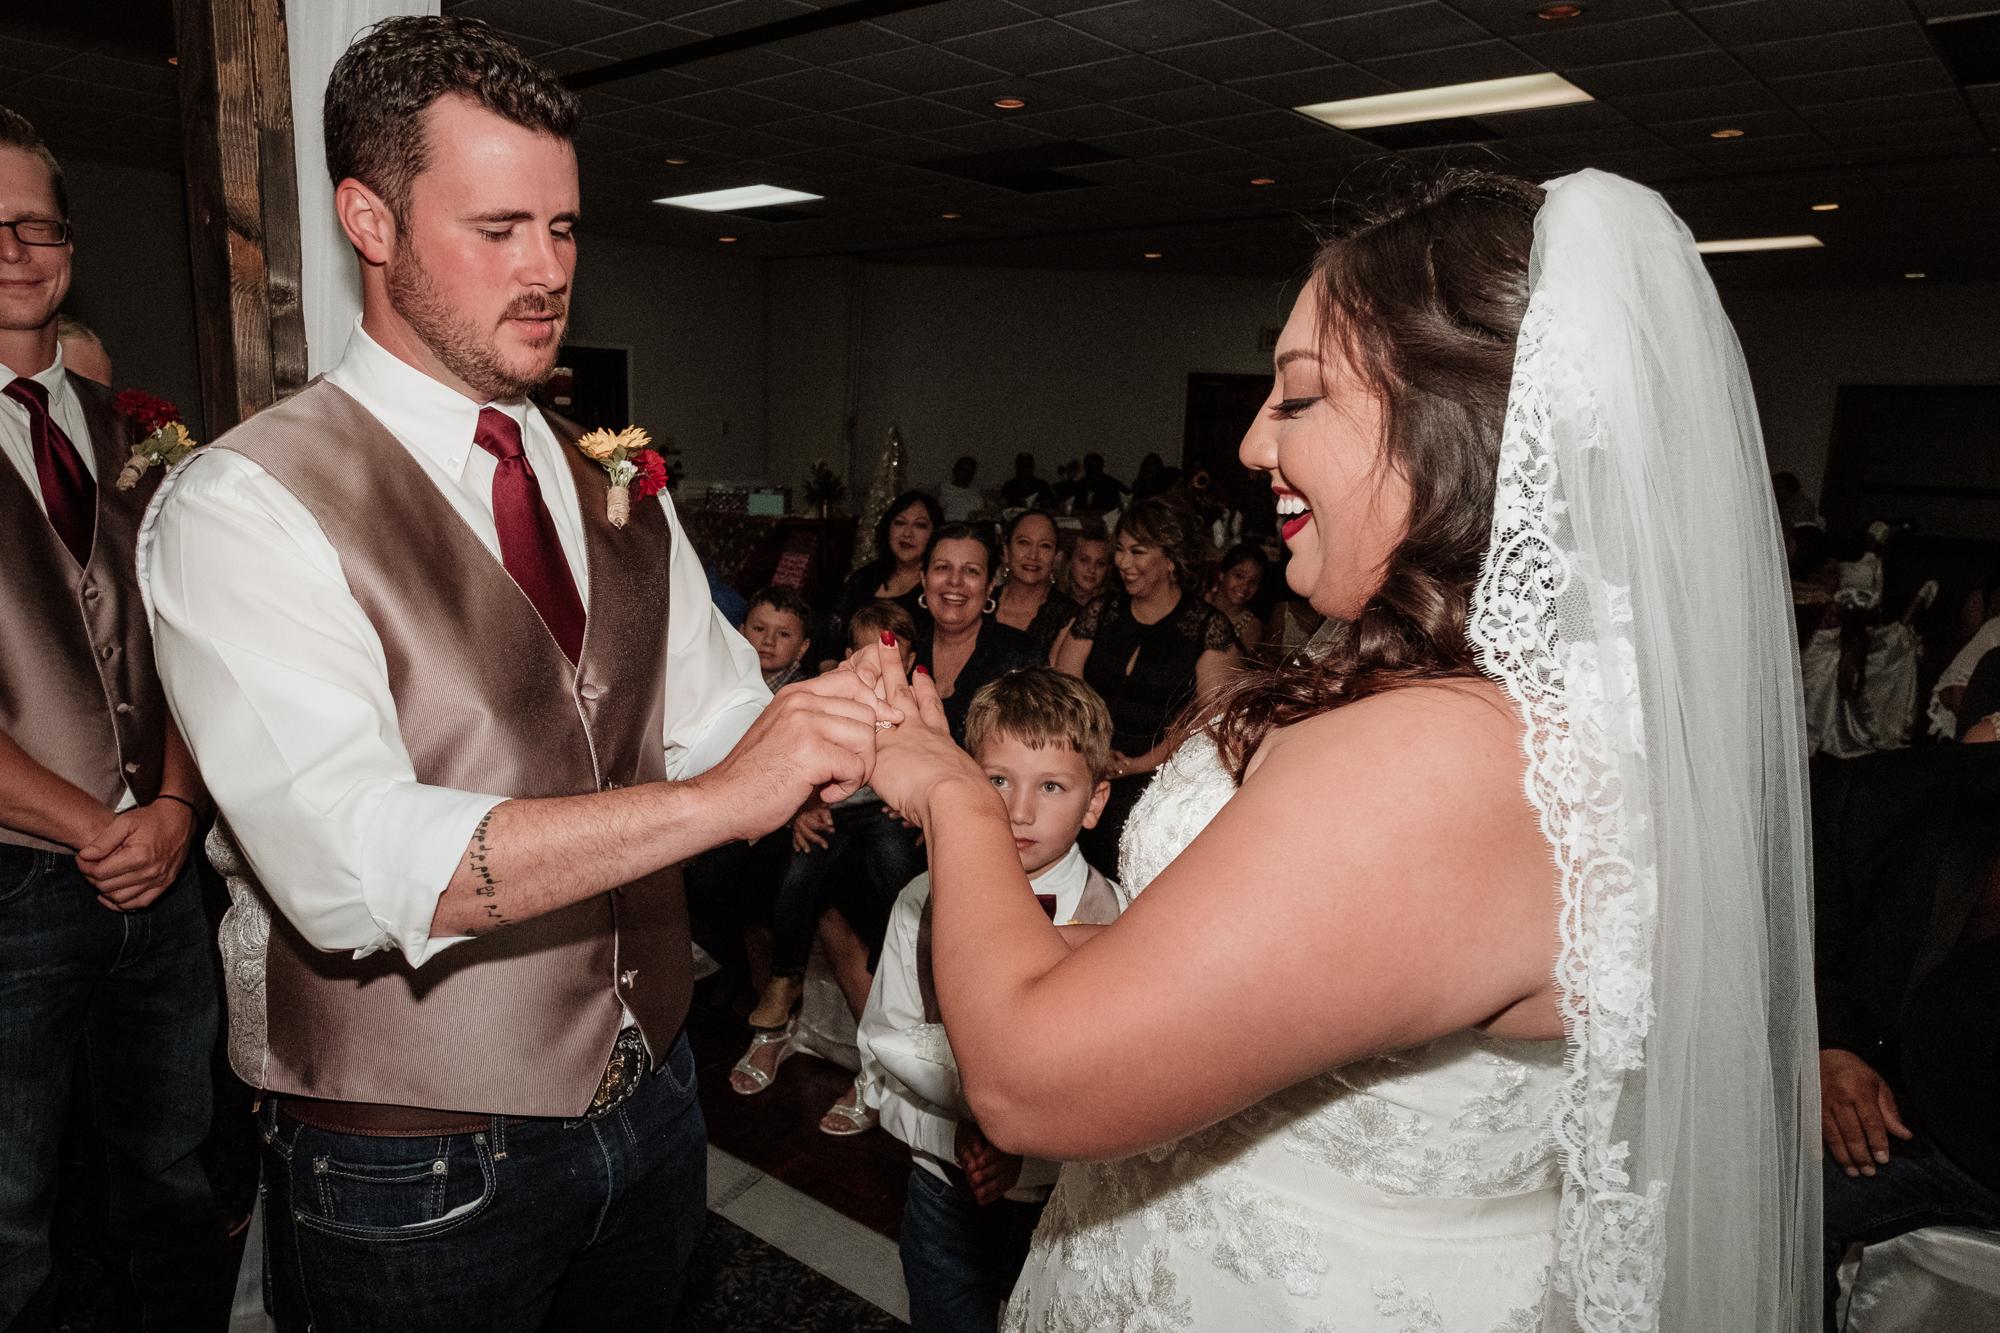 DallasAlyssa-Wedding-2019-JF-0859.jpg